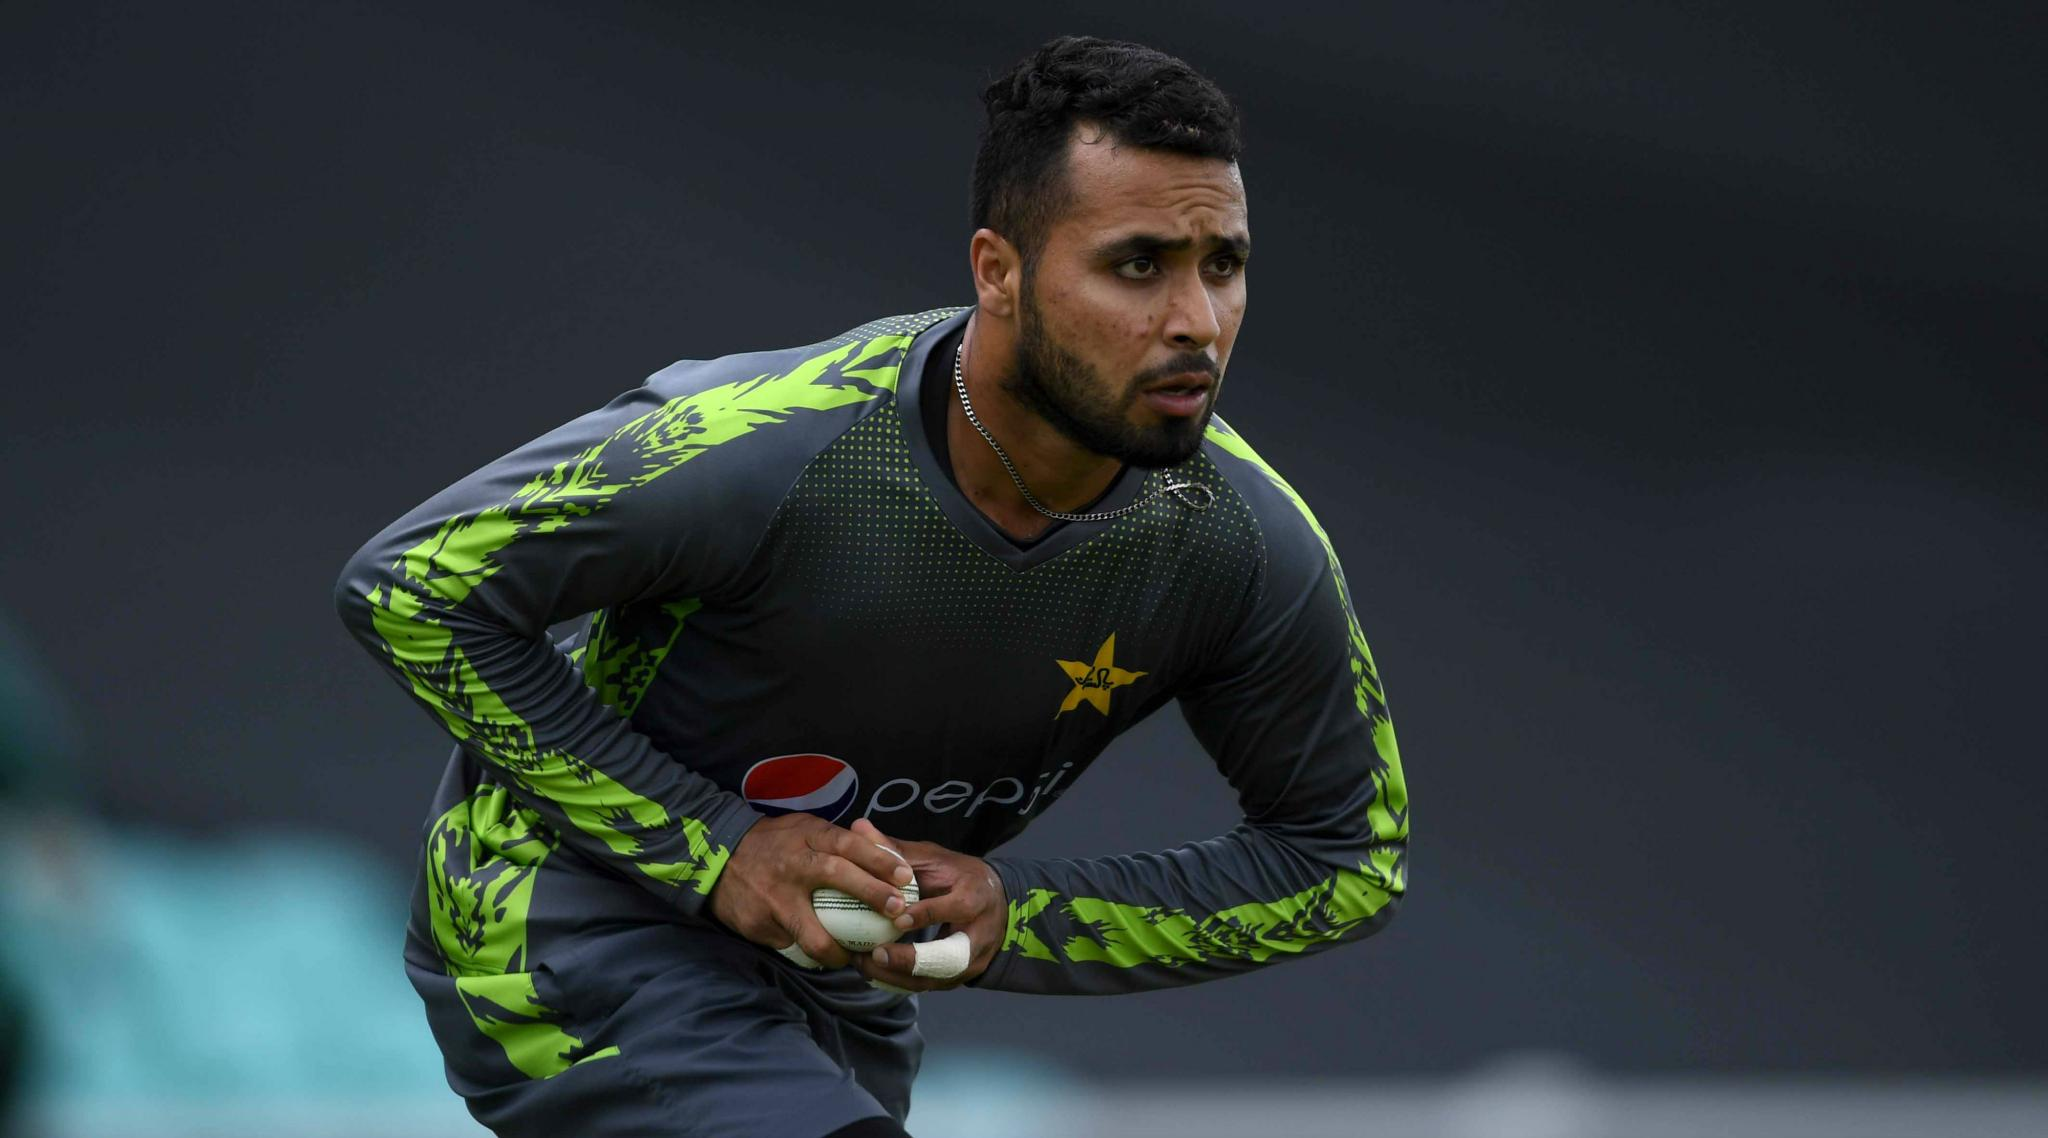 Big Bash League 2019-20: Melbourne Renegades Sign Pakistan Duo Faheem Ashraf and Usman Shinwari  for Upcoming Tournament